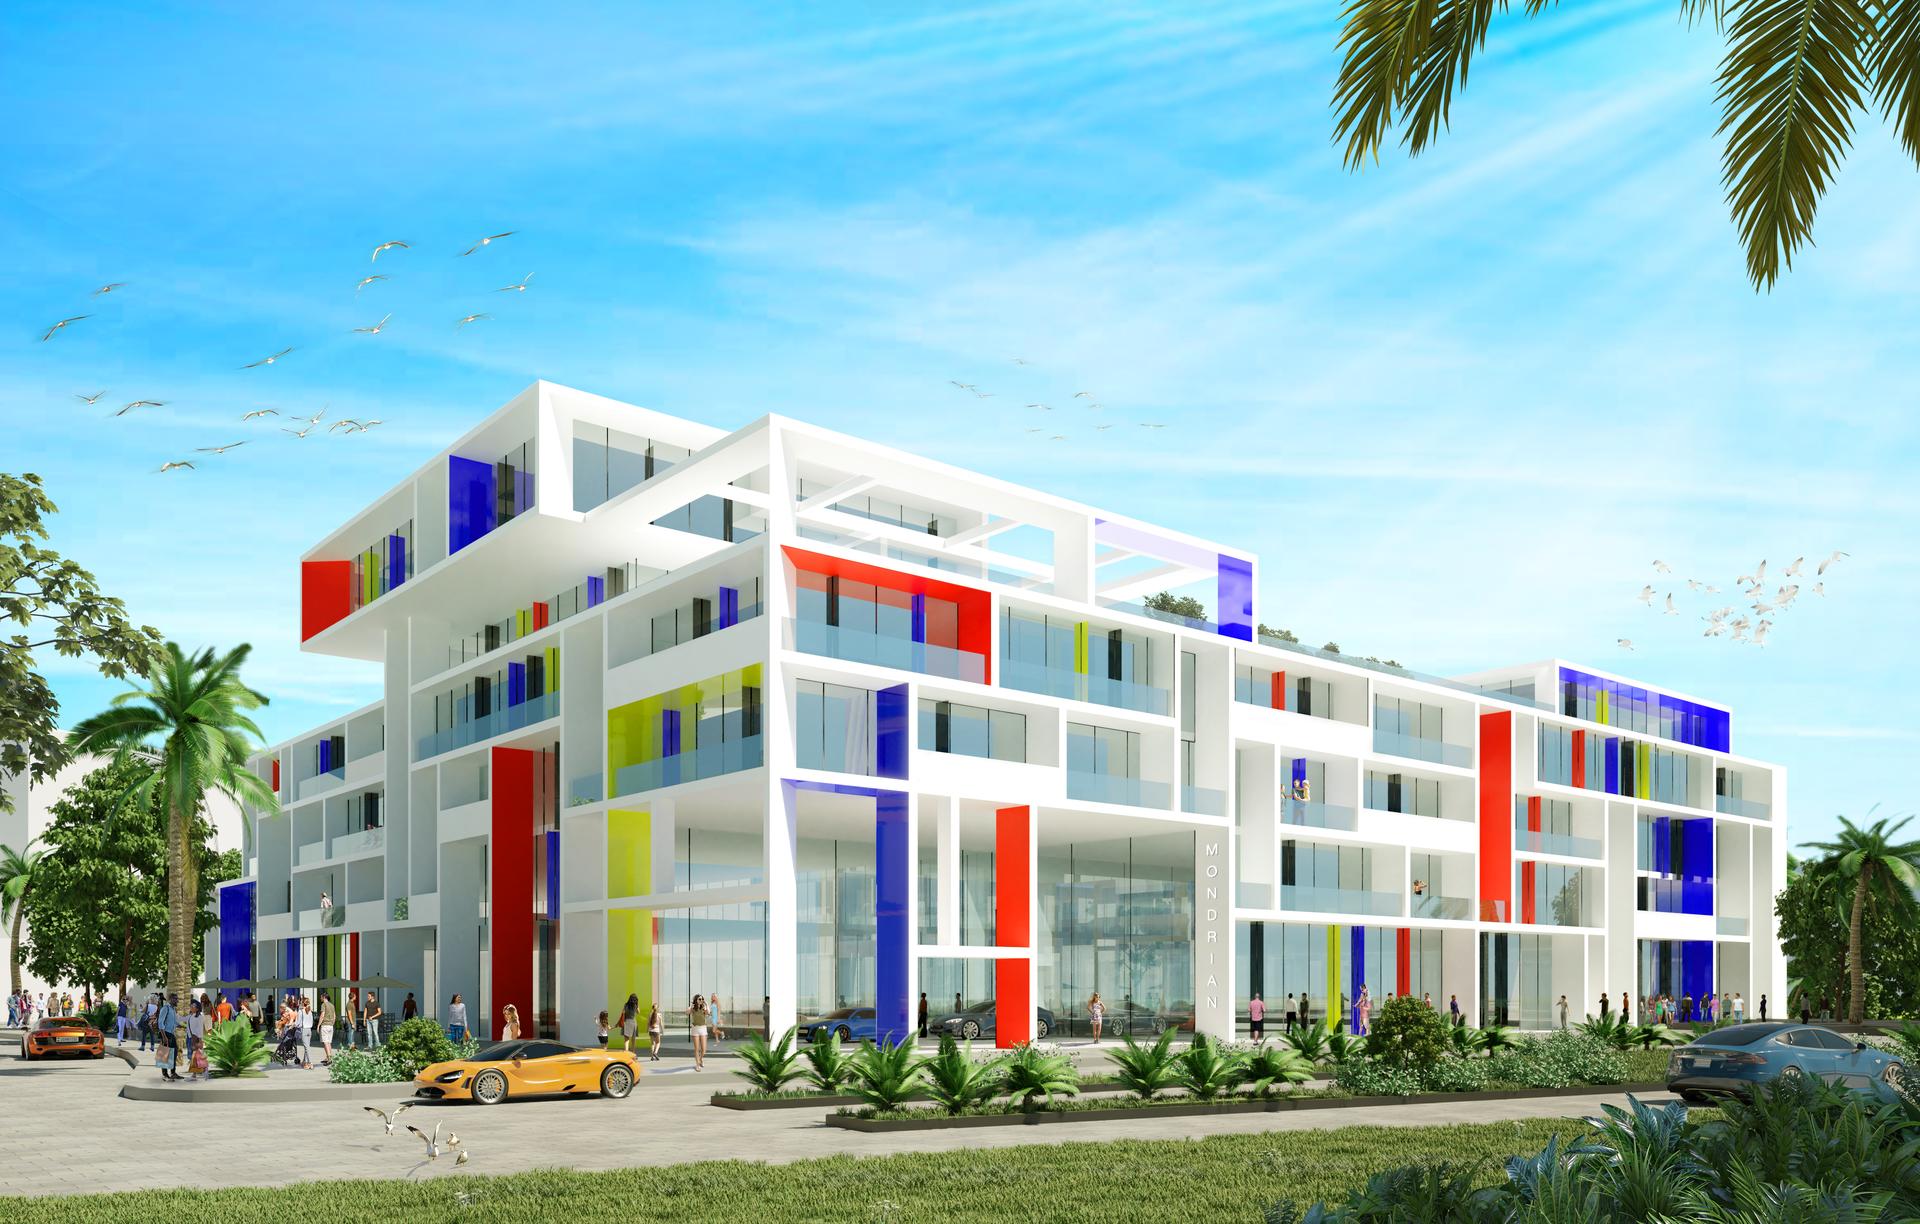 A beautiful new 200-key hotel that Palma is developing.